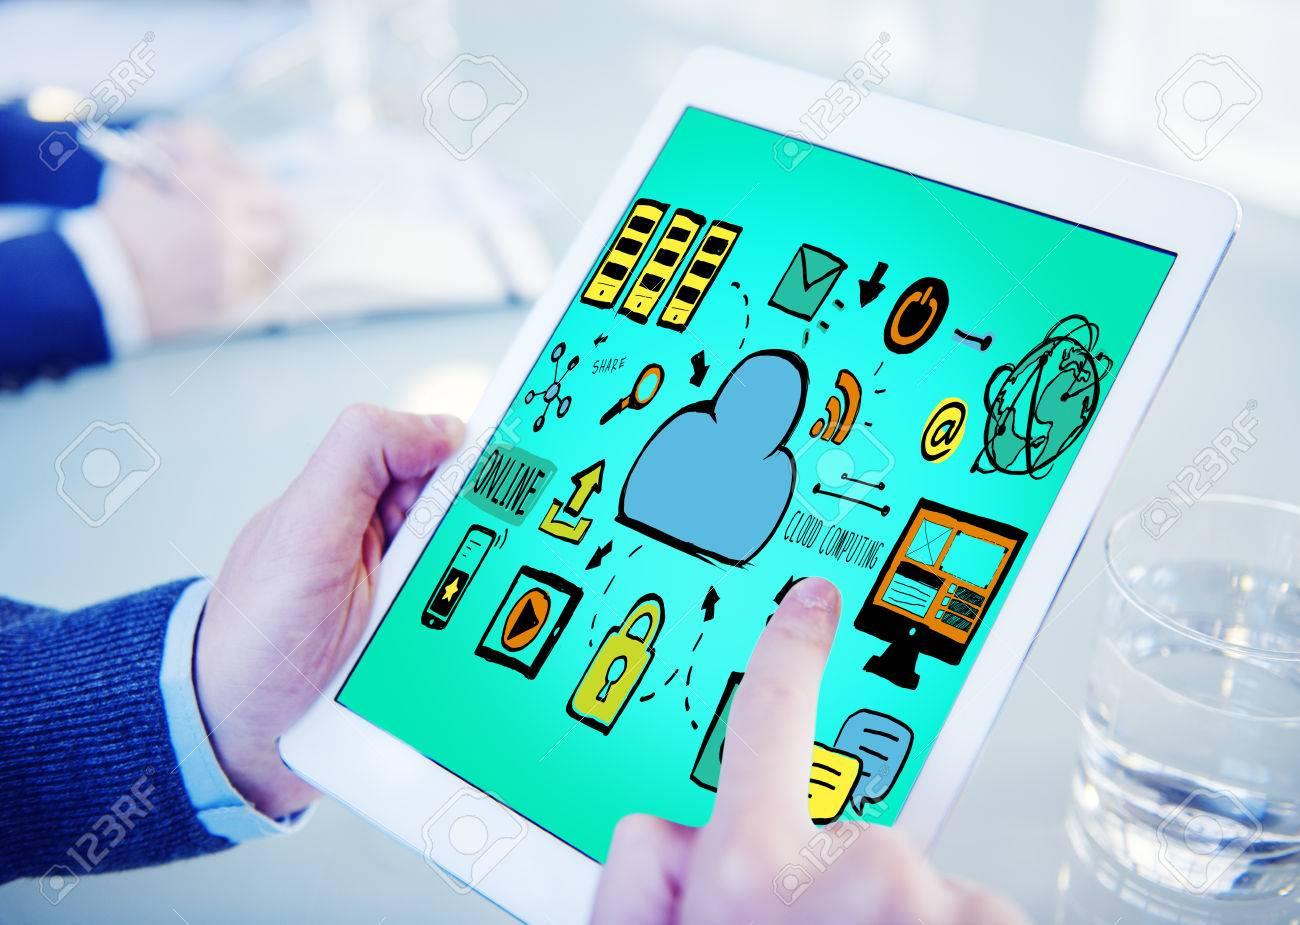 Cloud Computing Network Online Internet Storage Concept Stock ...